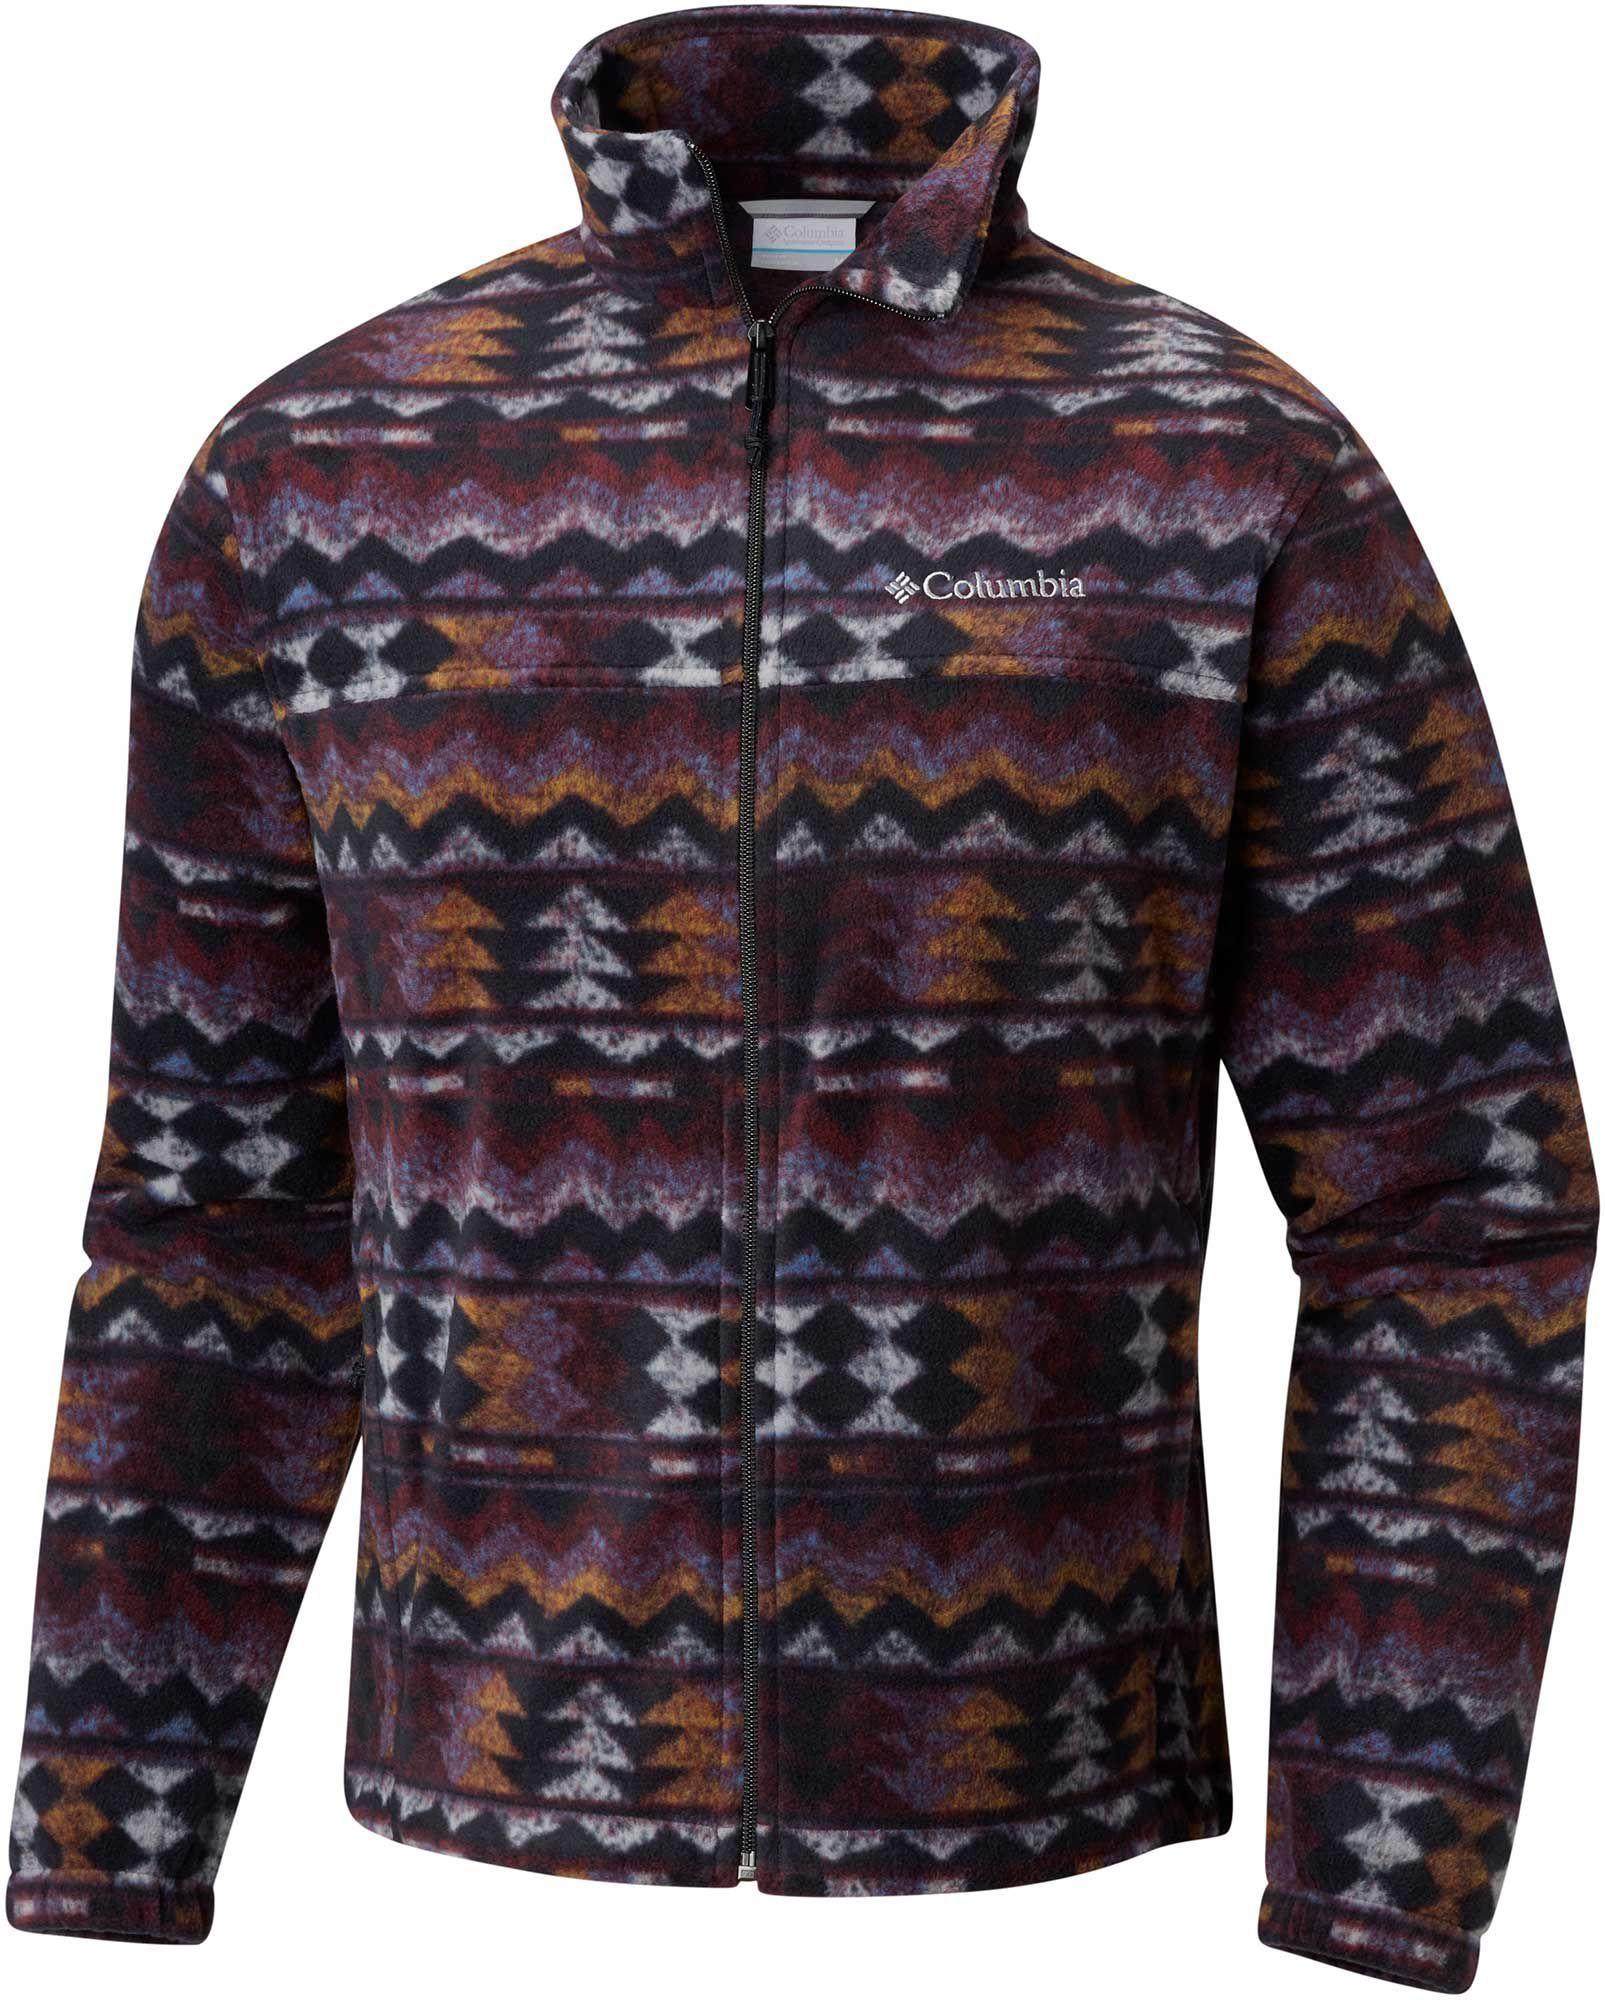 5ac56578d Columbia Men's Steens Mountain Print Fleece Jacket, Size: Small ...